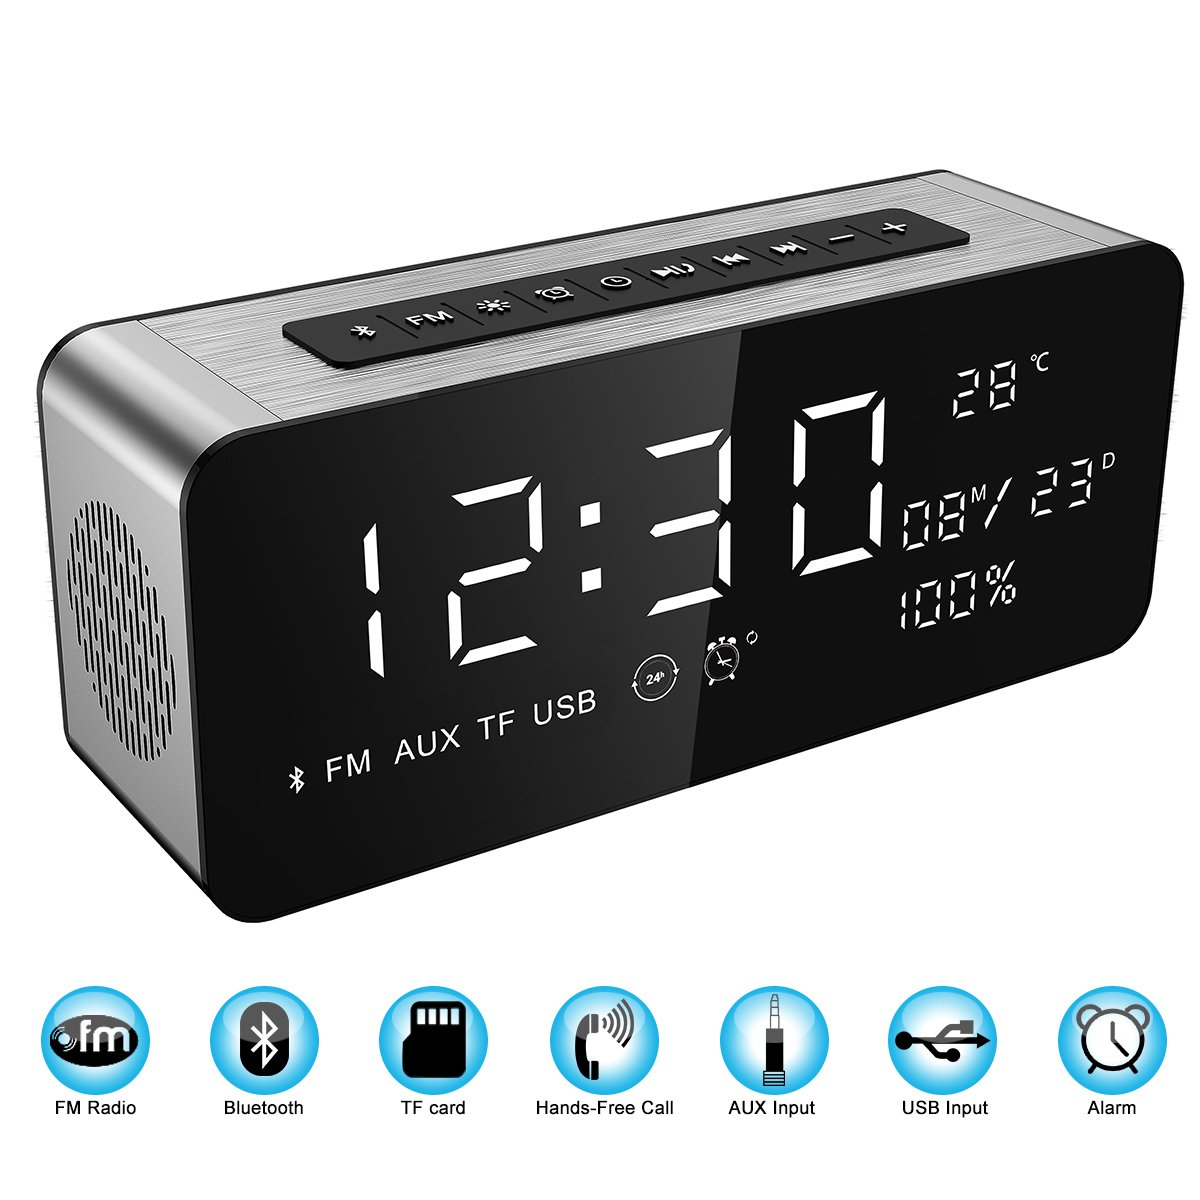 Un Parleur Radio Réveil Bluetooth Écran Avec Haut Soundance Grand yg6fYb7